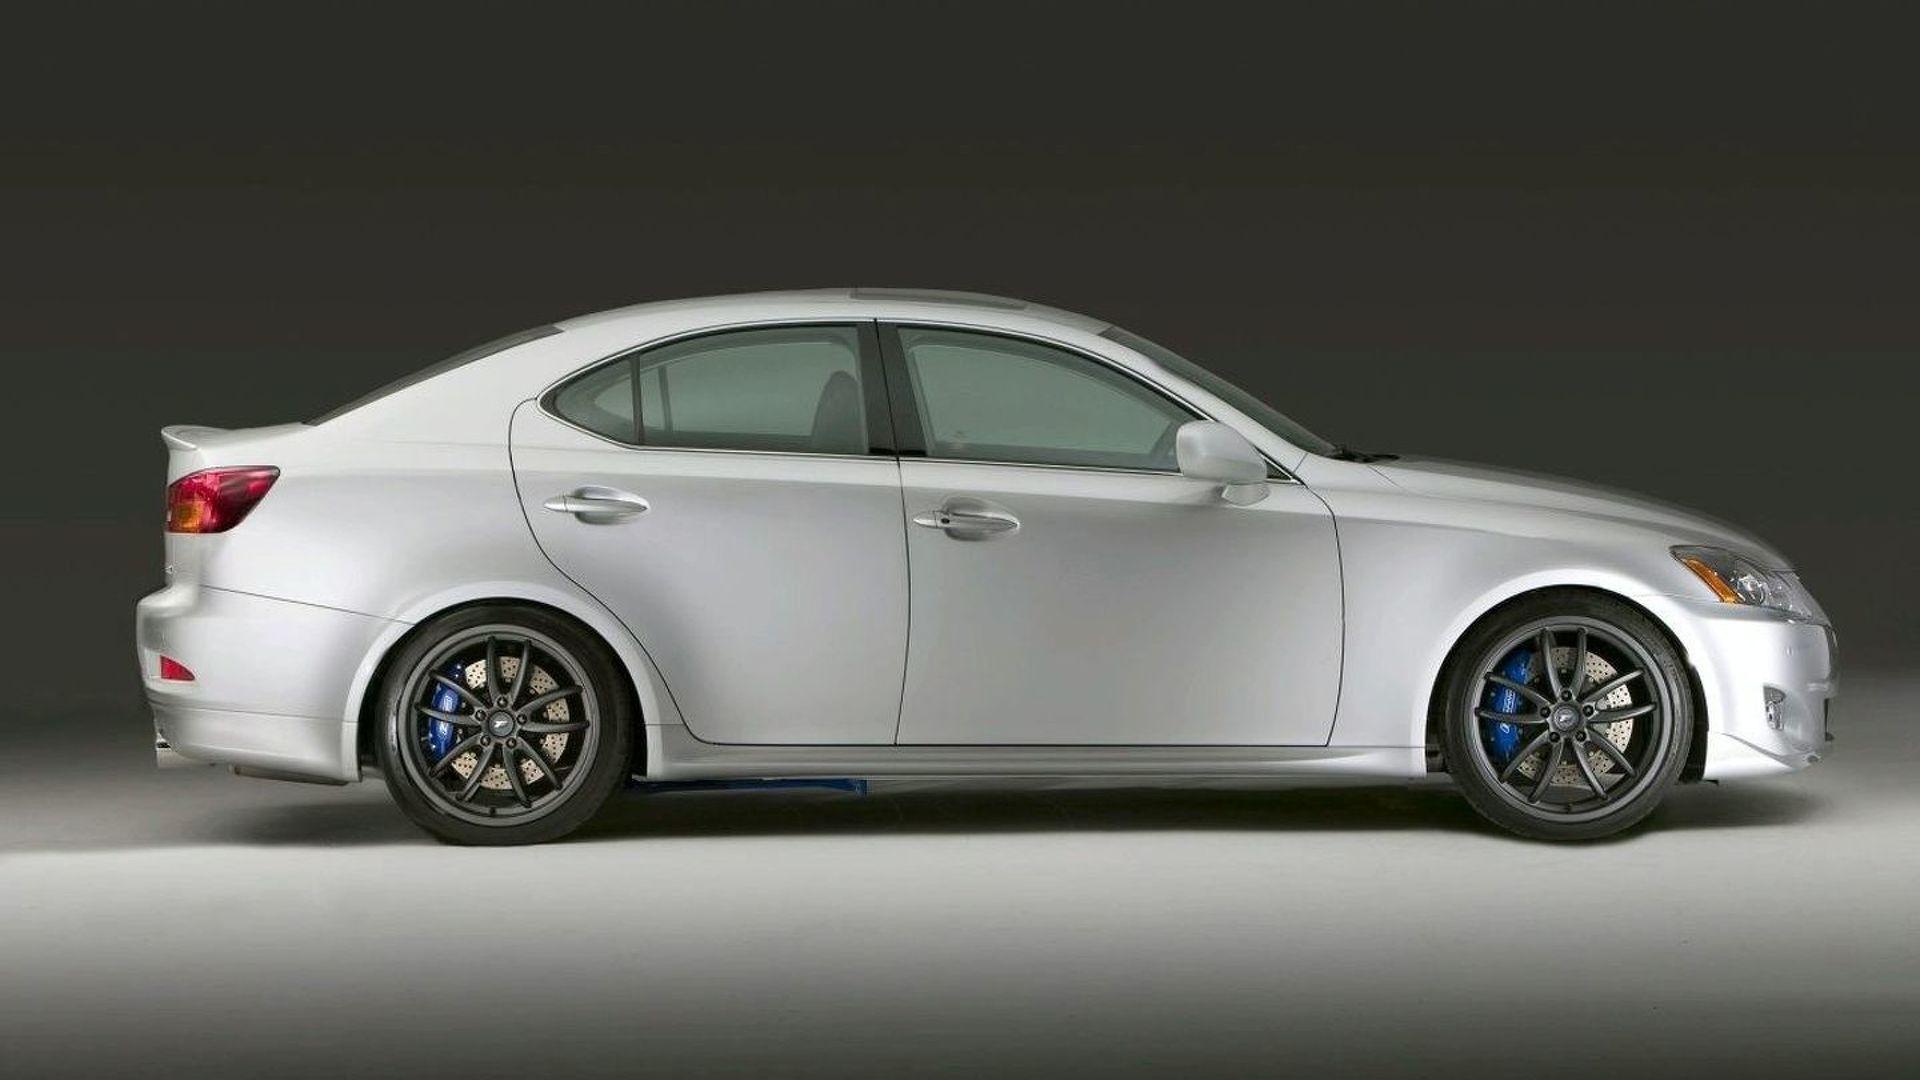 Lexus Debuts F Sport Performance Accessory Line at SEMA